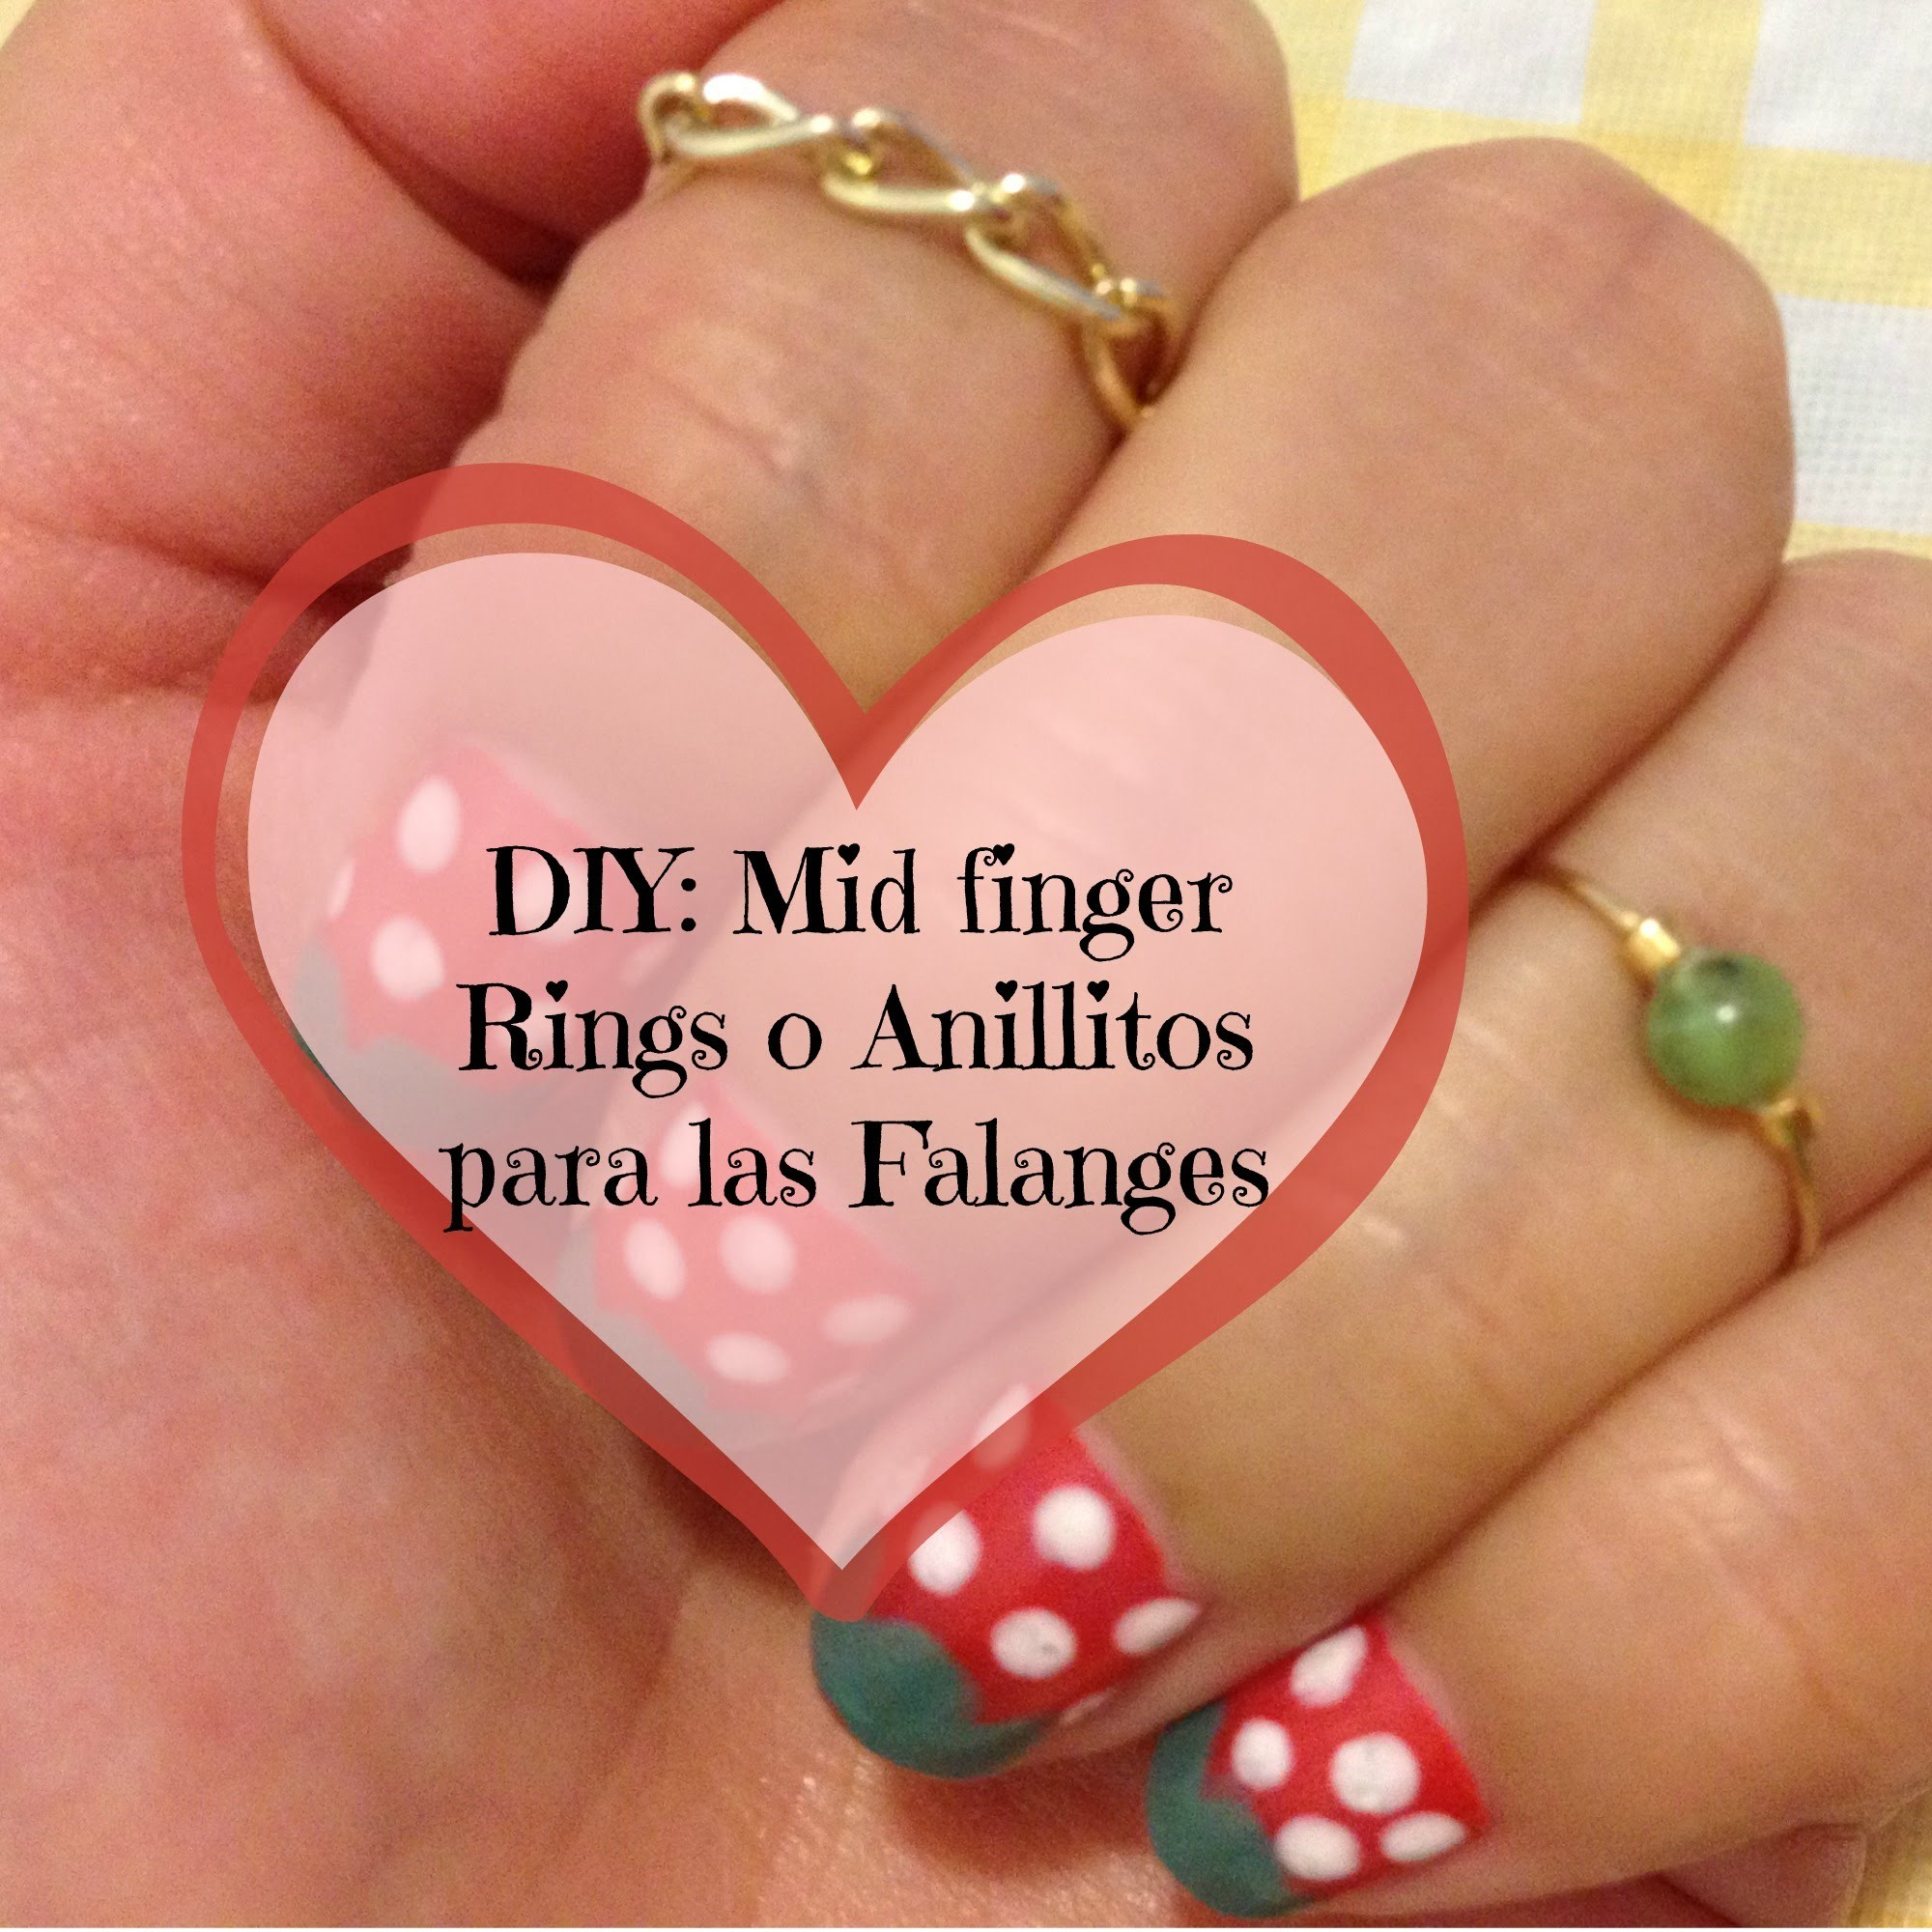 DIY mid finger Rings o anillitos de falange, hazlo tu misma I Lorentix